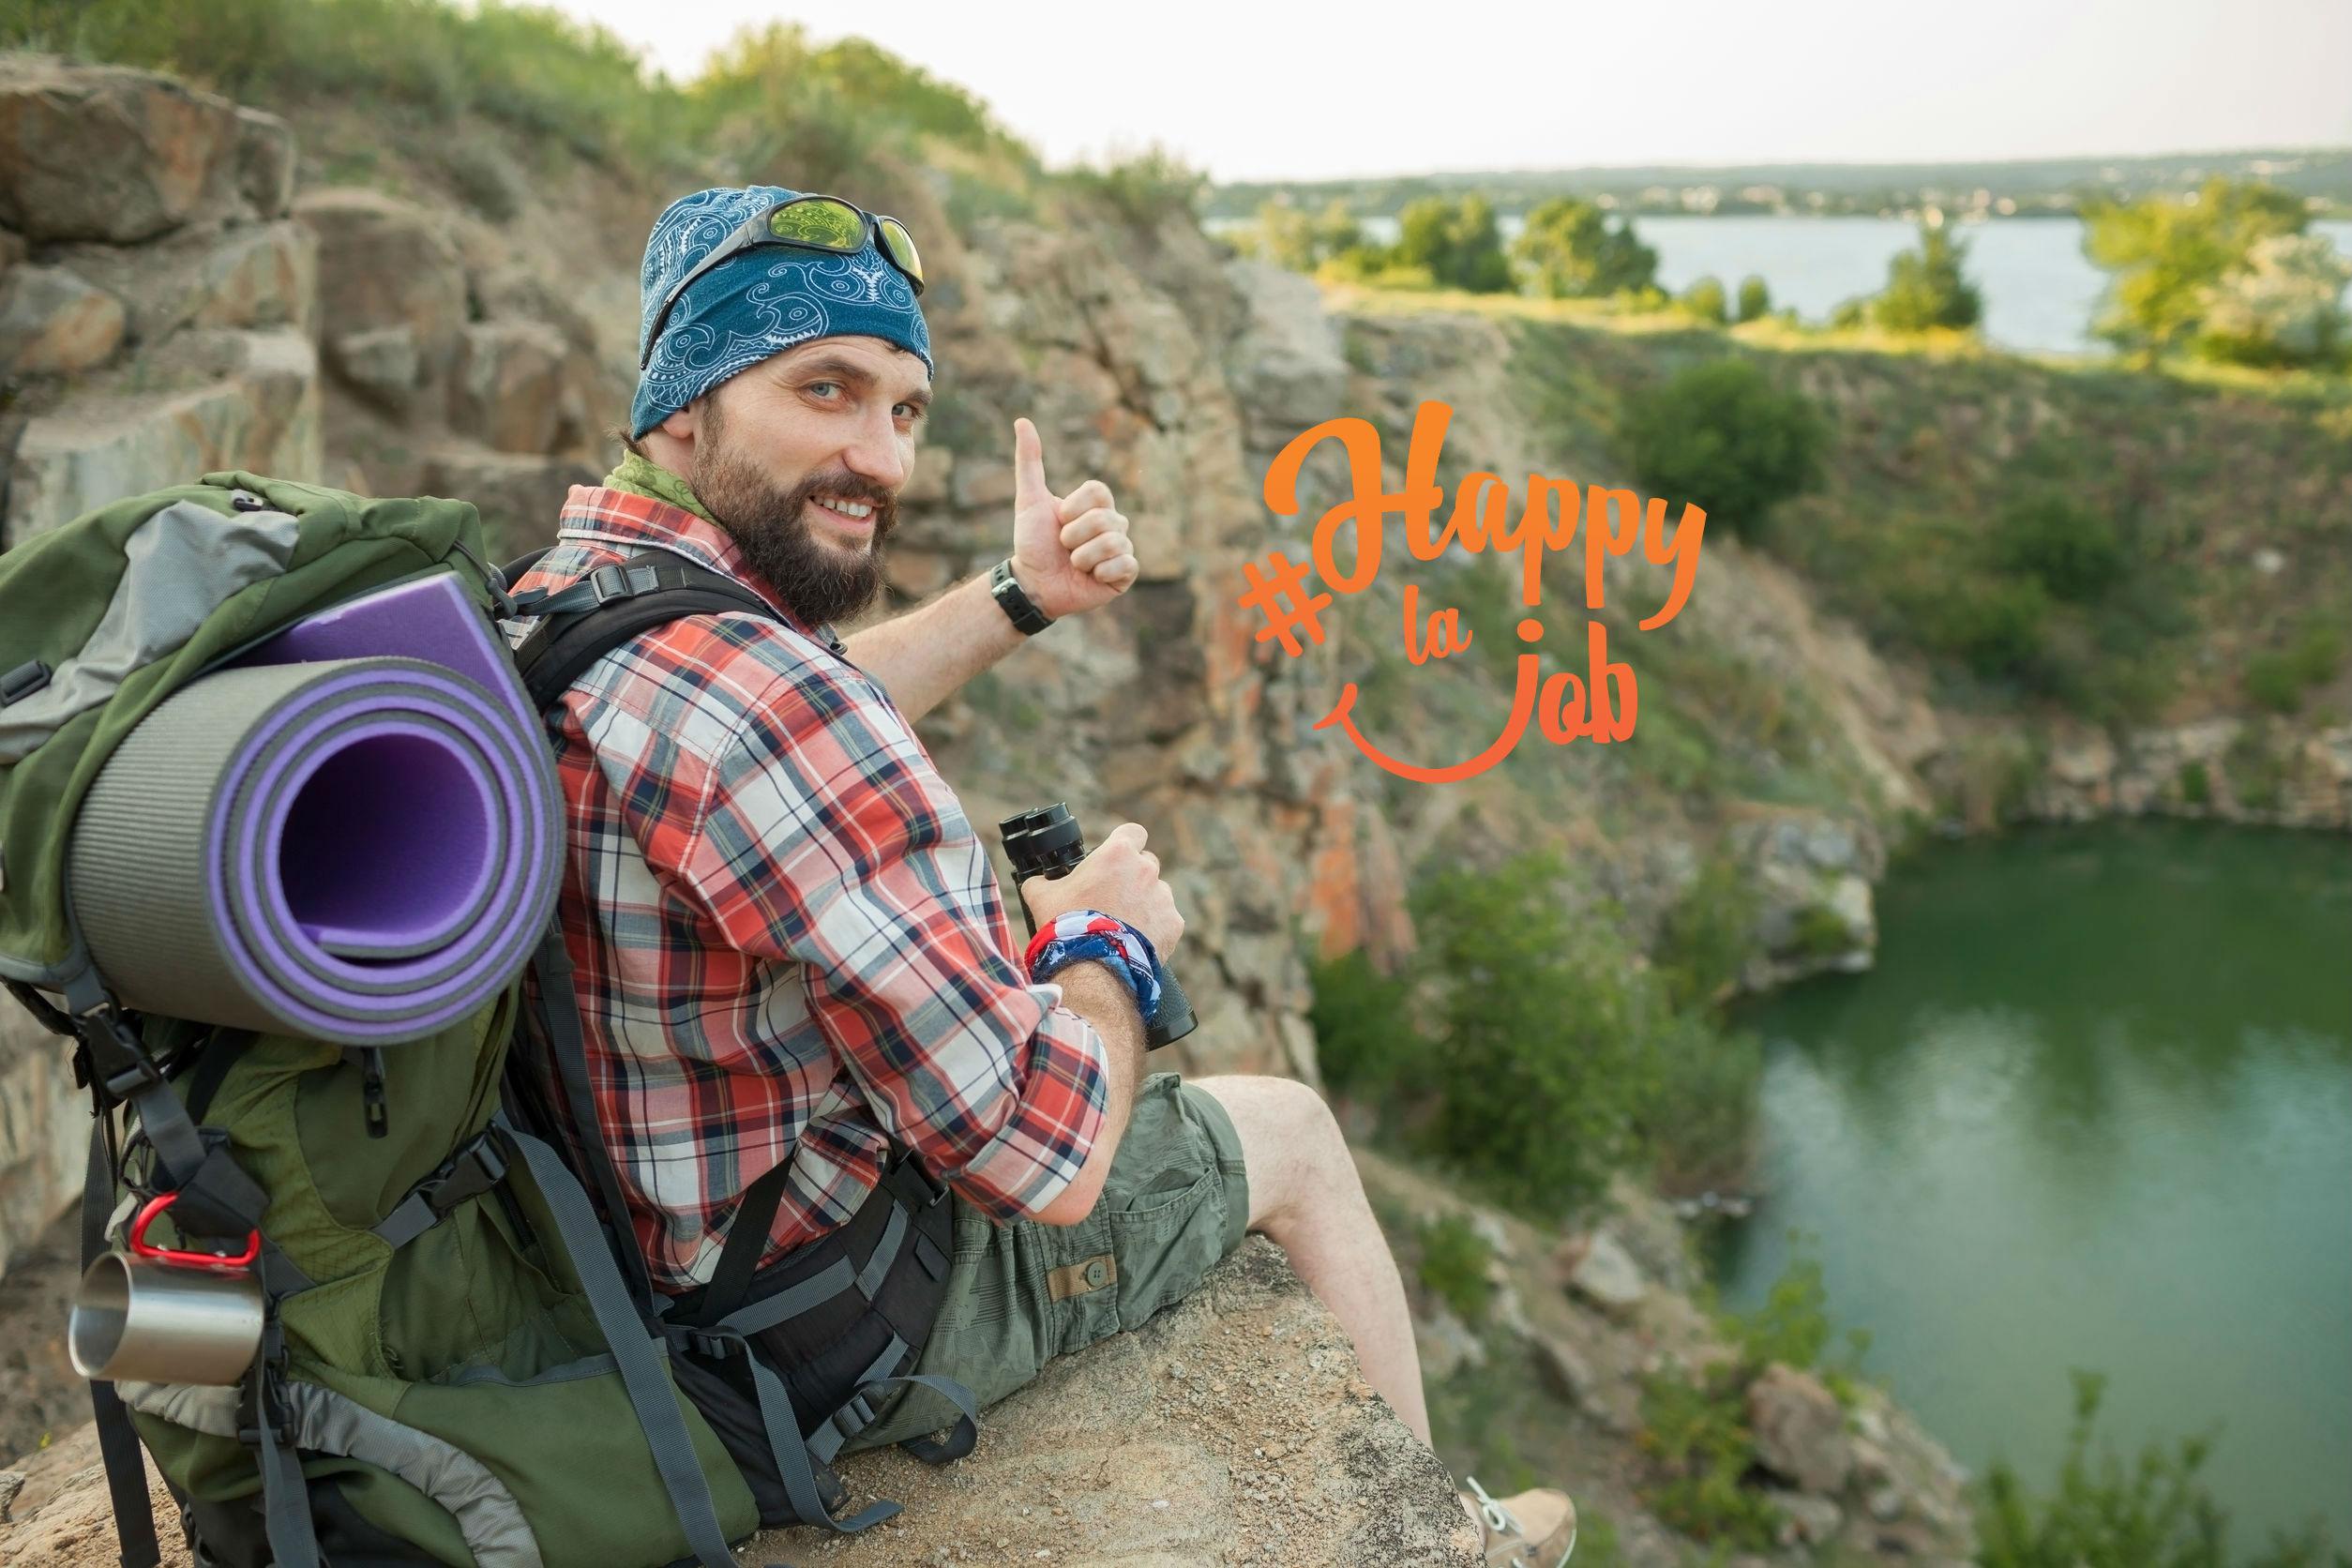 3 Joburi Happy: De la hobby la angajare